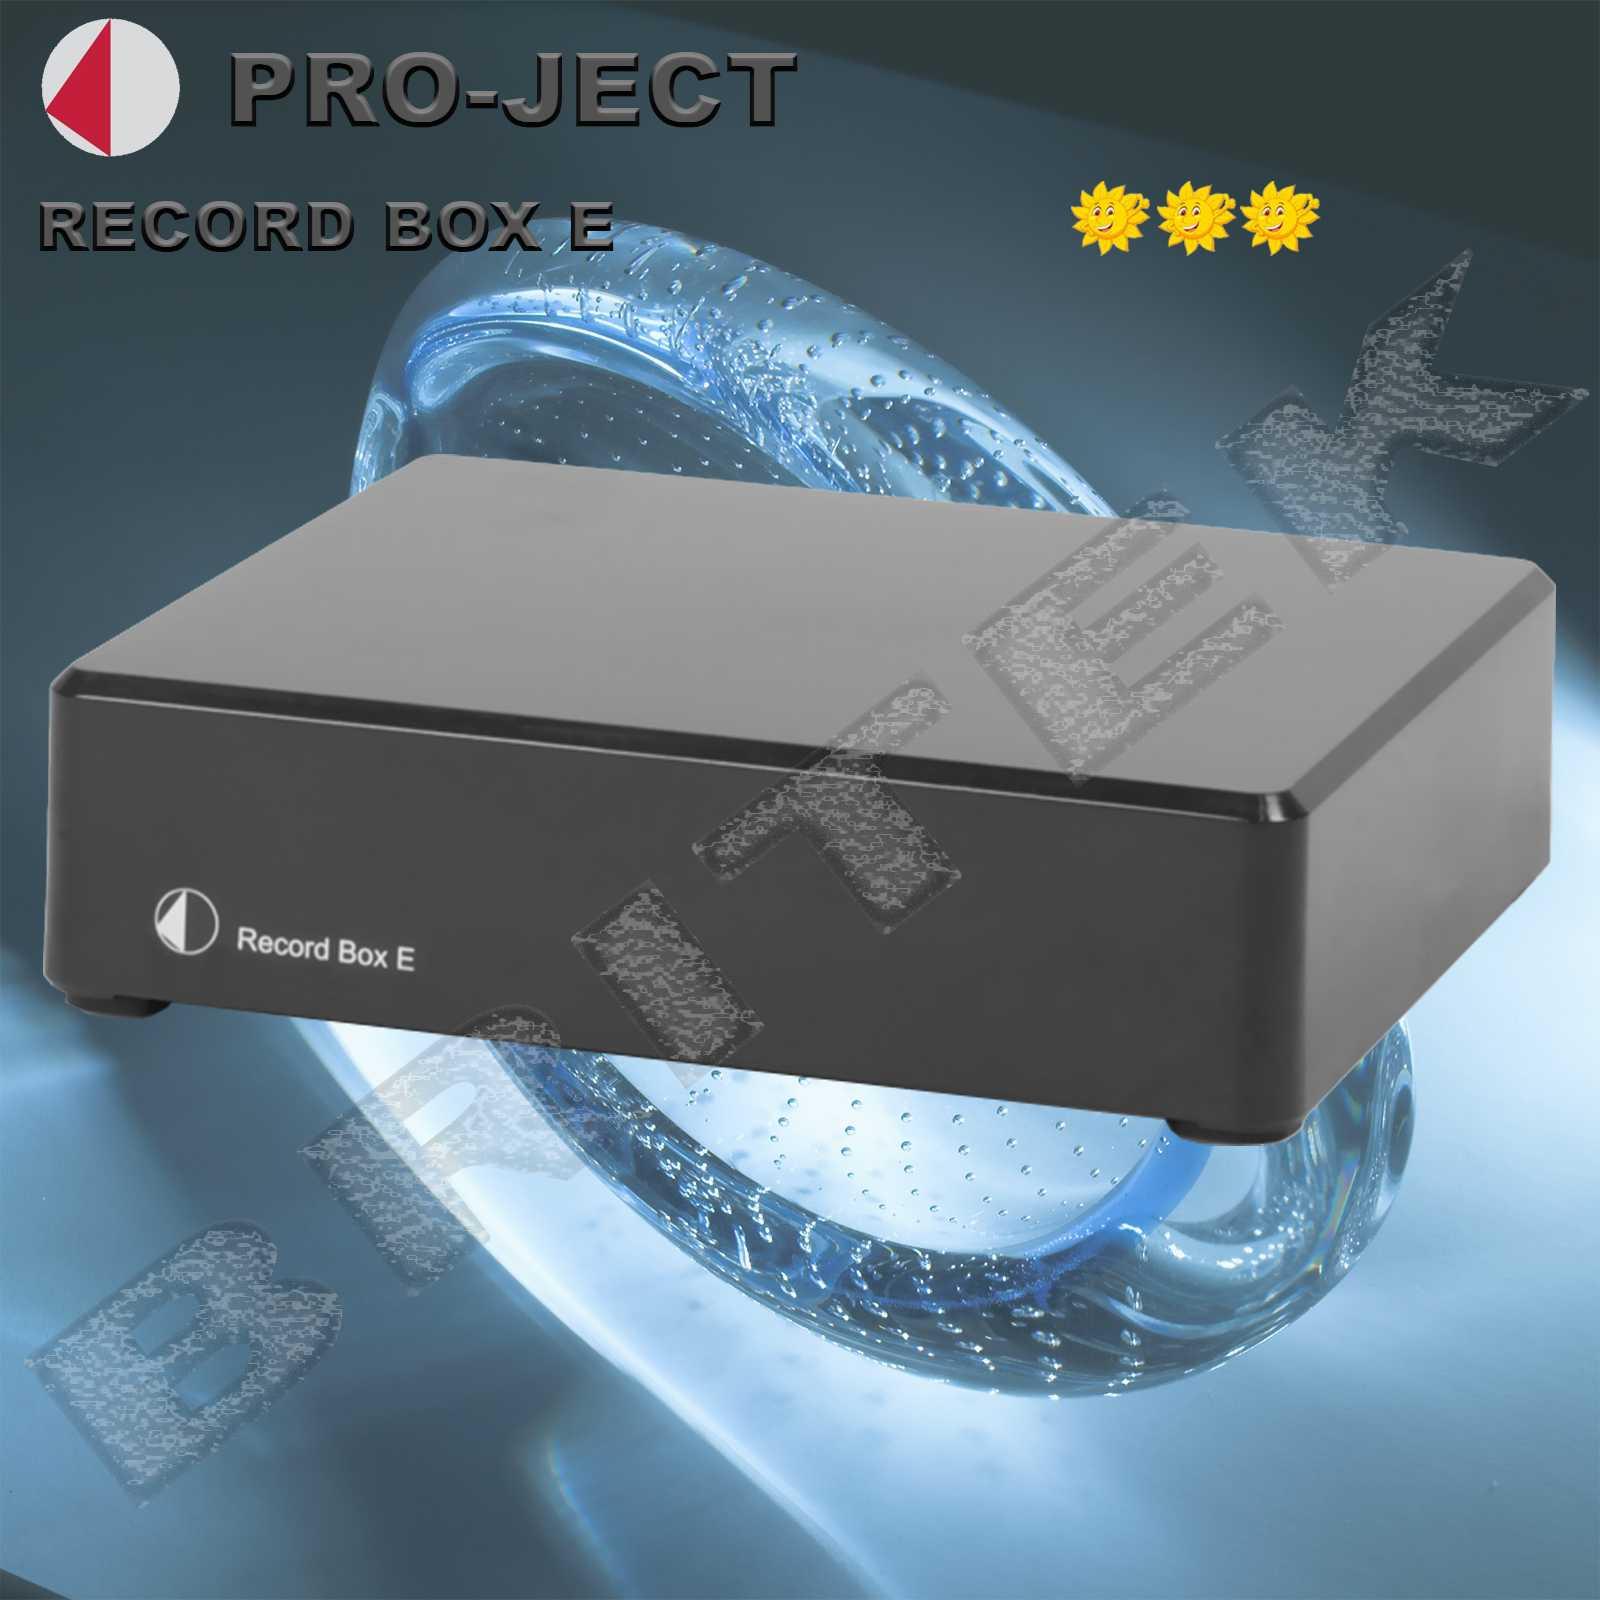 Pro-Ject Record Box E Black